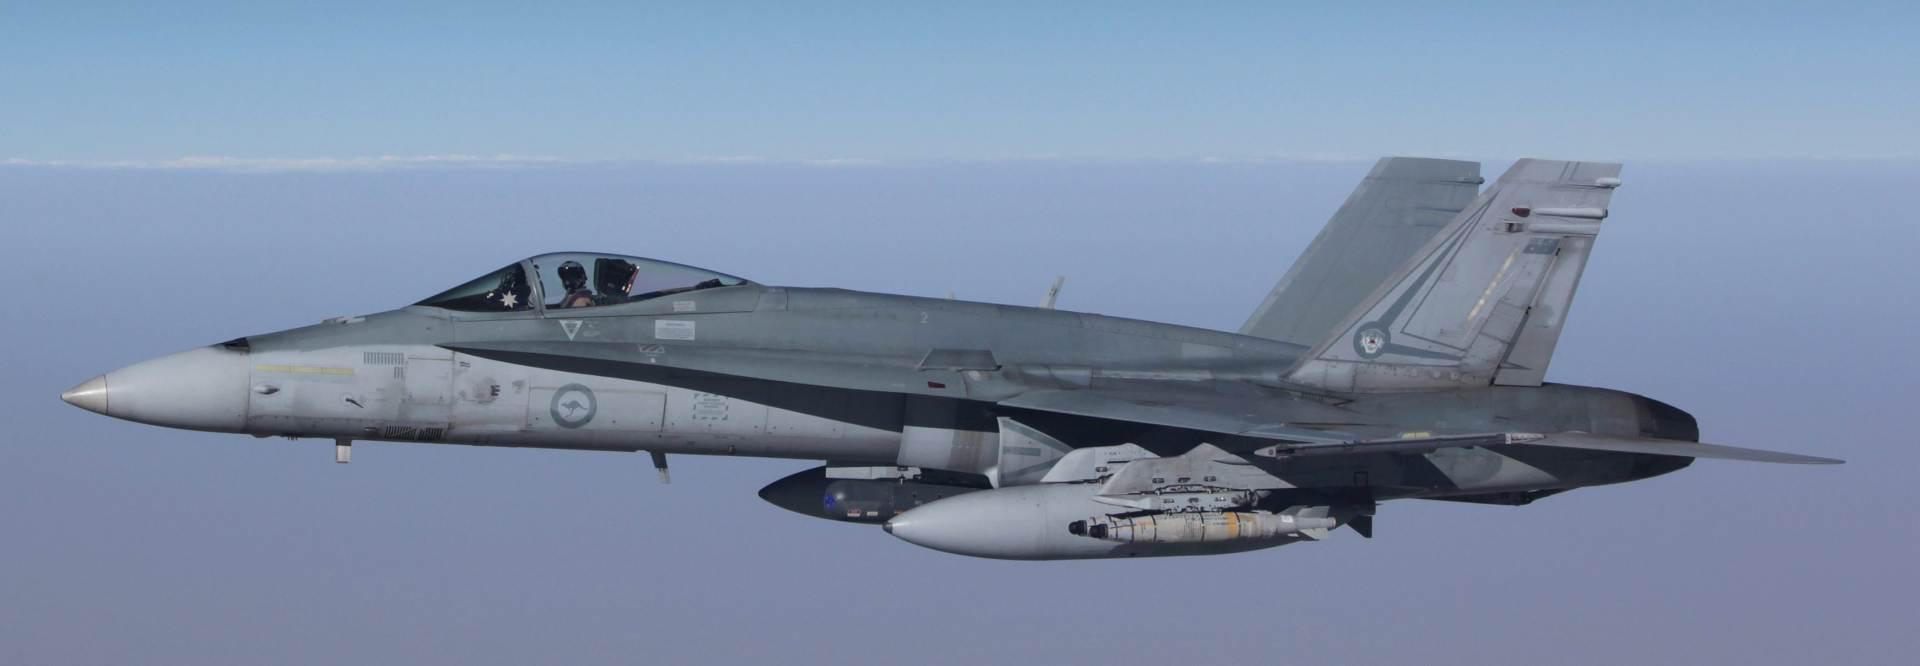 BORBA PROTIV ISIL-a: Francuska će poslati nosač zrakoplova Charles de Gaulle prema Siriji